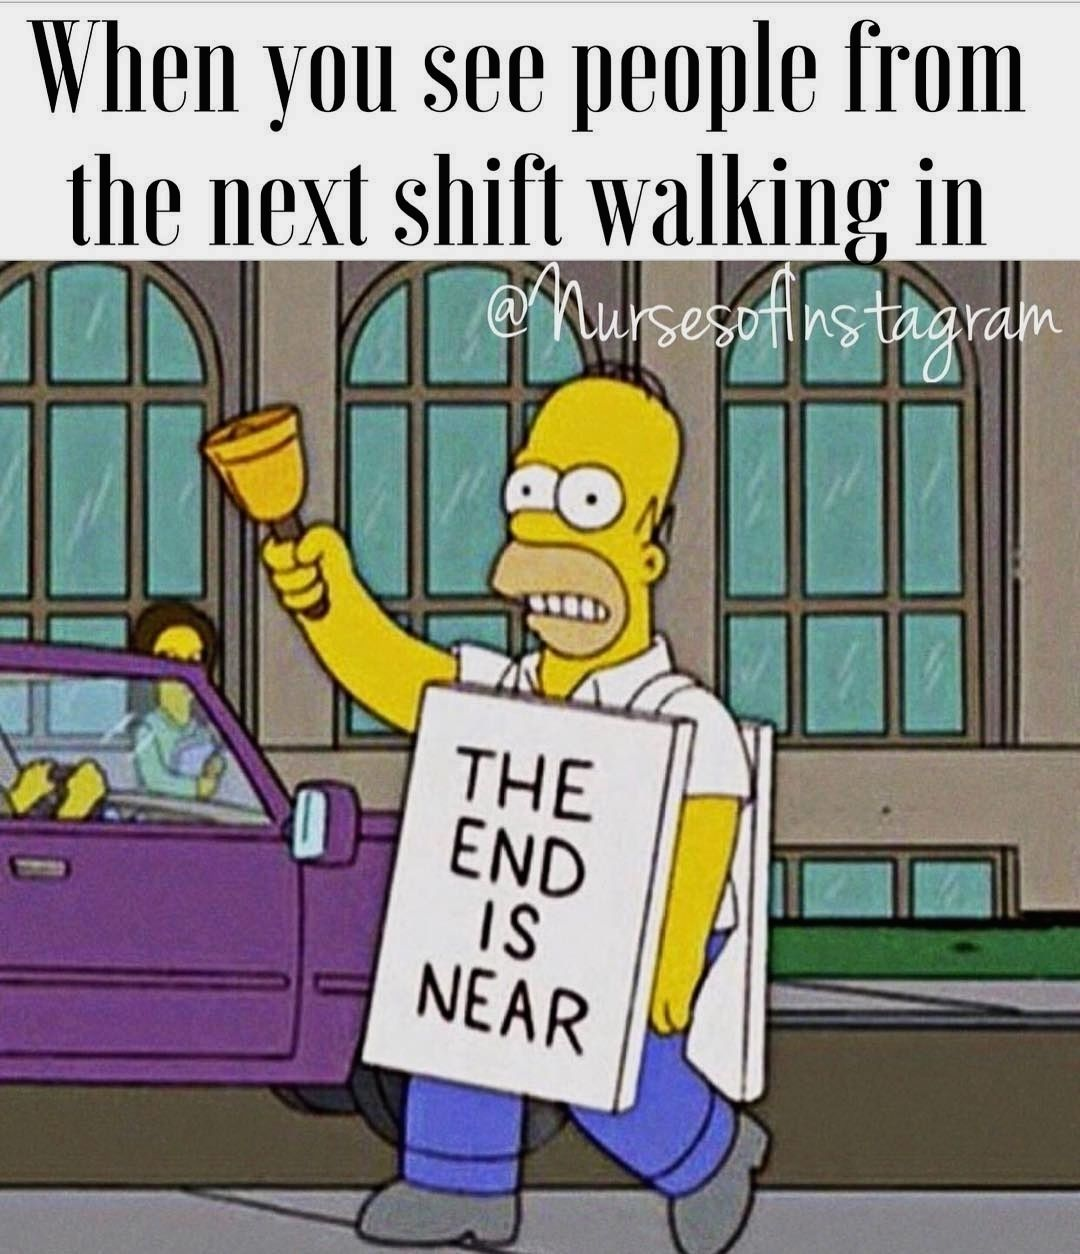 Nursing Jobs Near Me 2019 Nurse jokes, Hospital humor